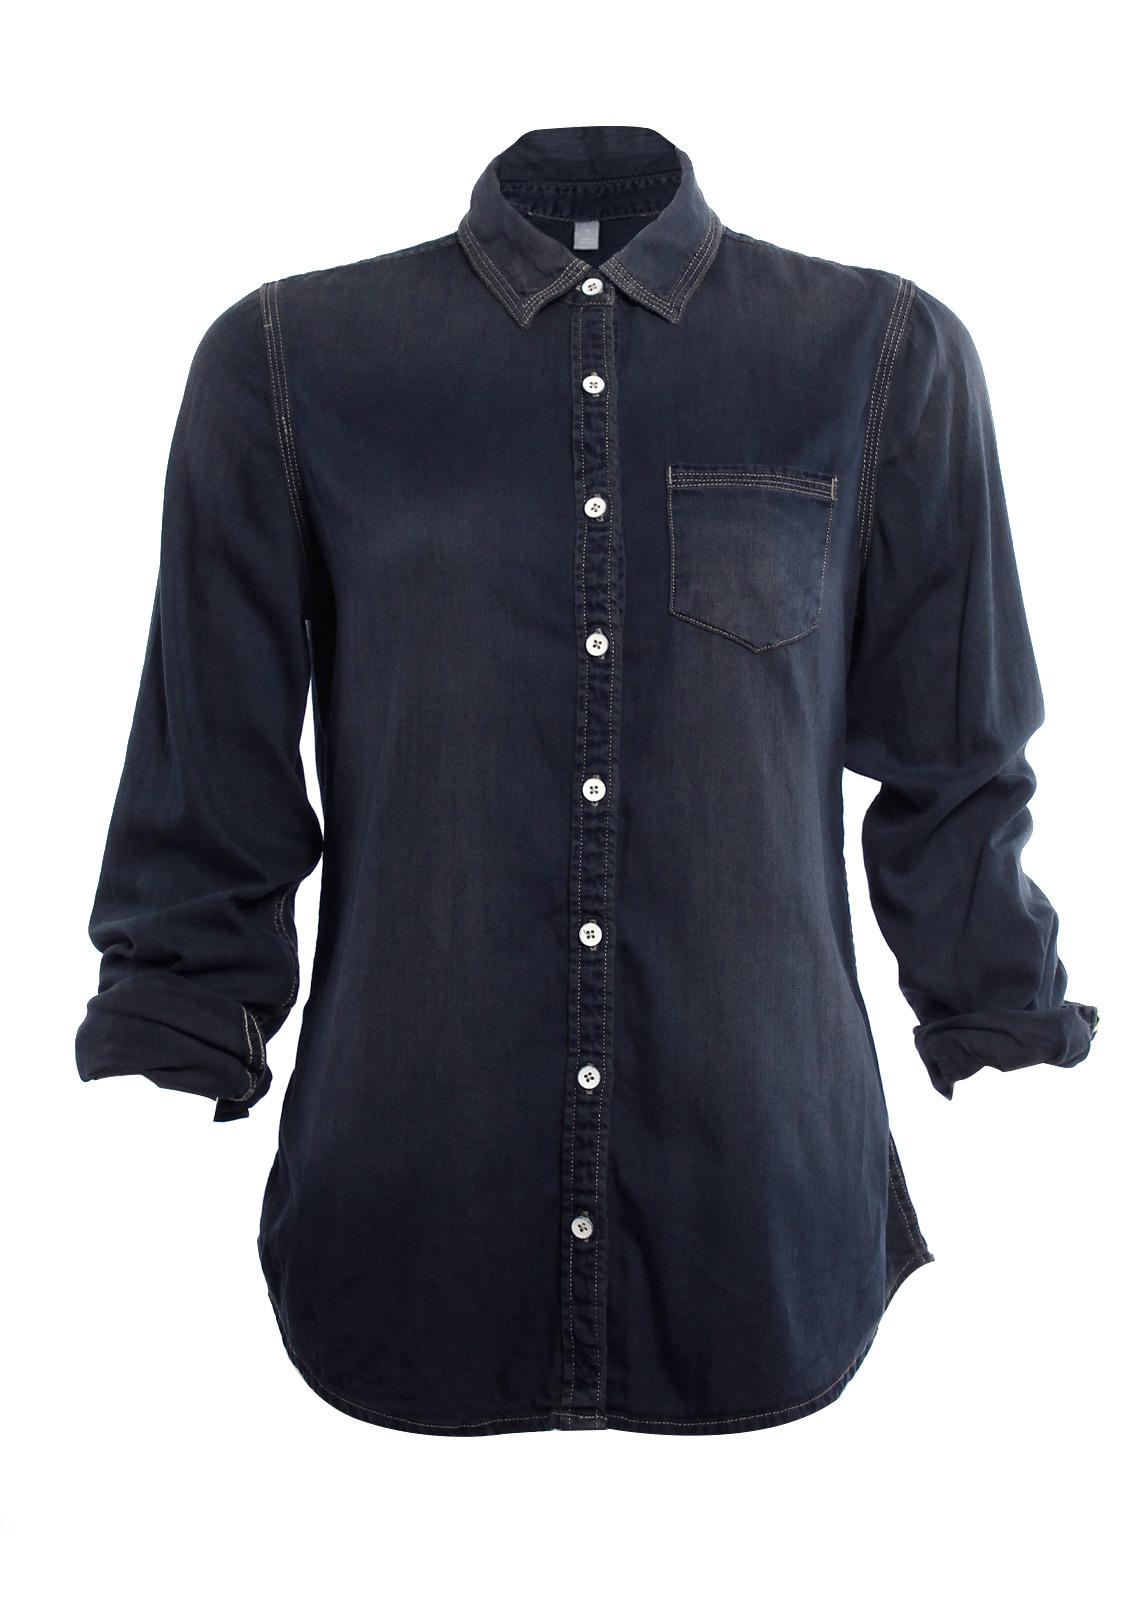 Womens Fitted Long Sleeve Denim Shirt Top Button Down